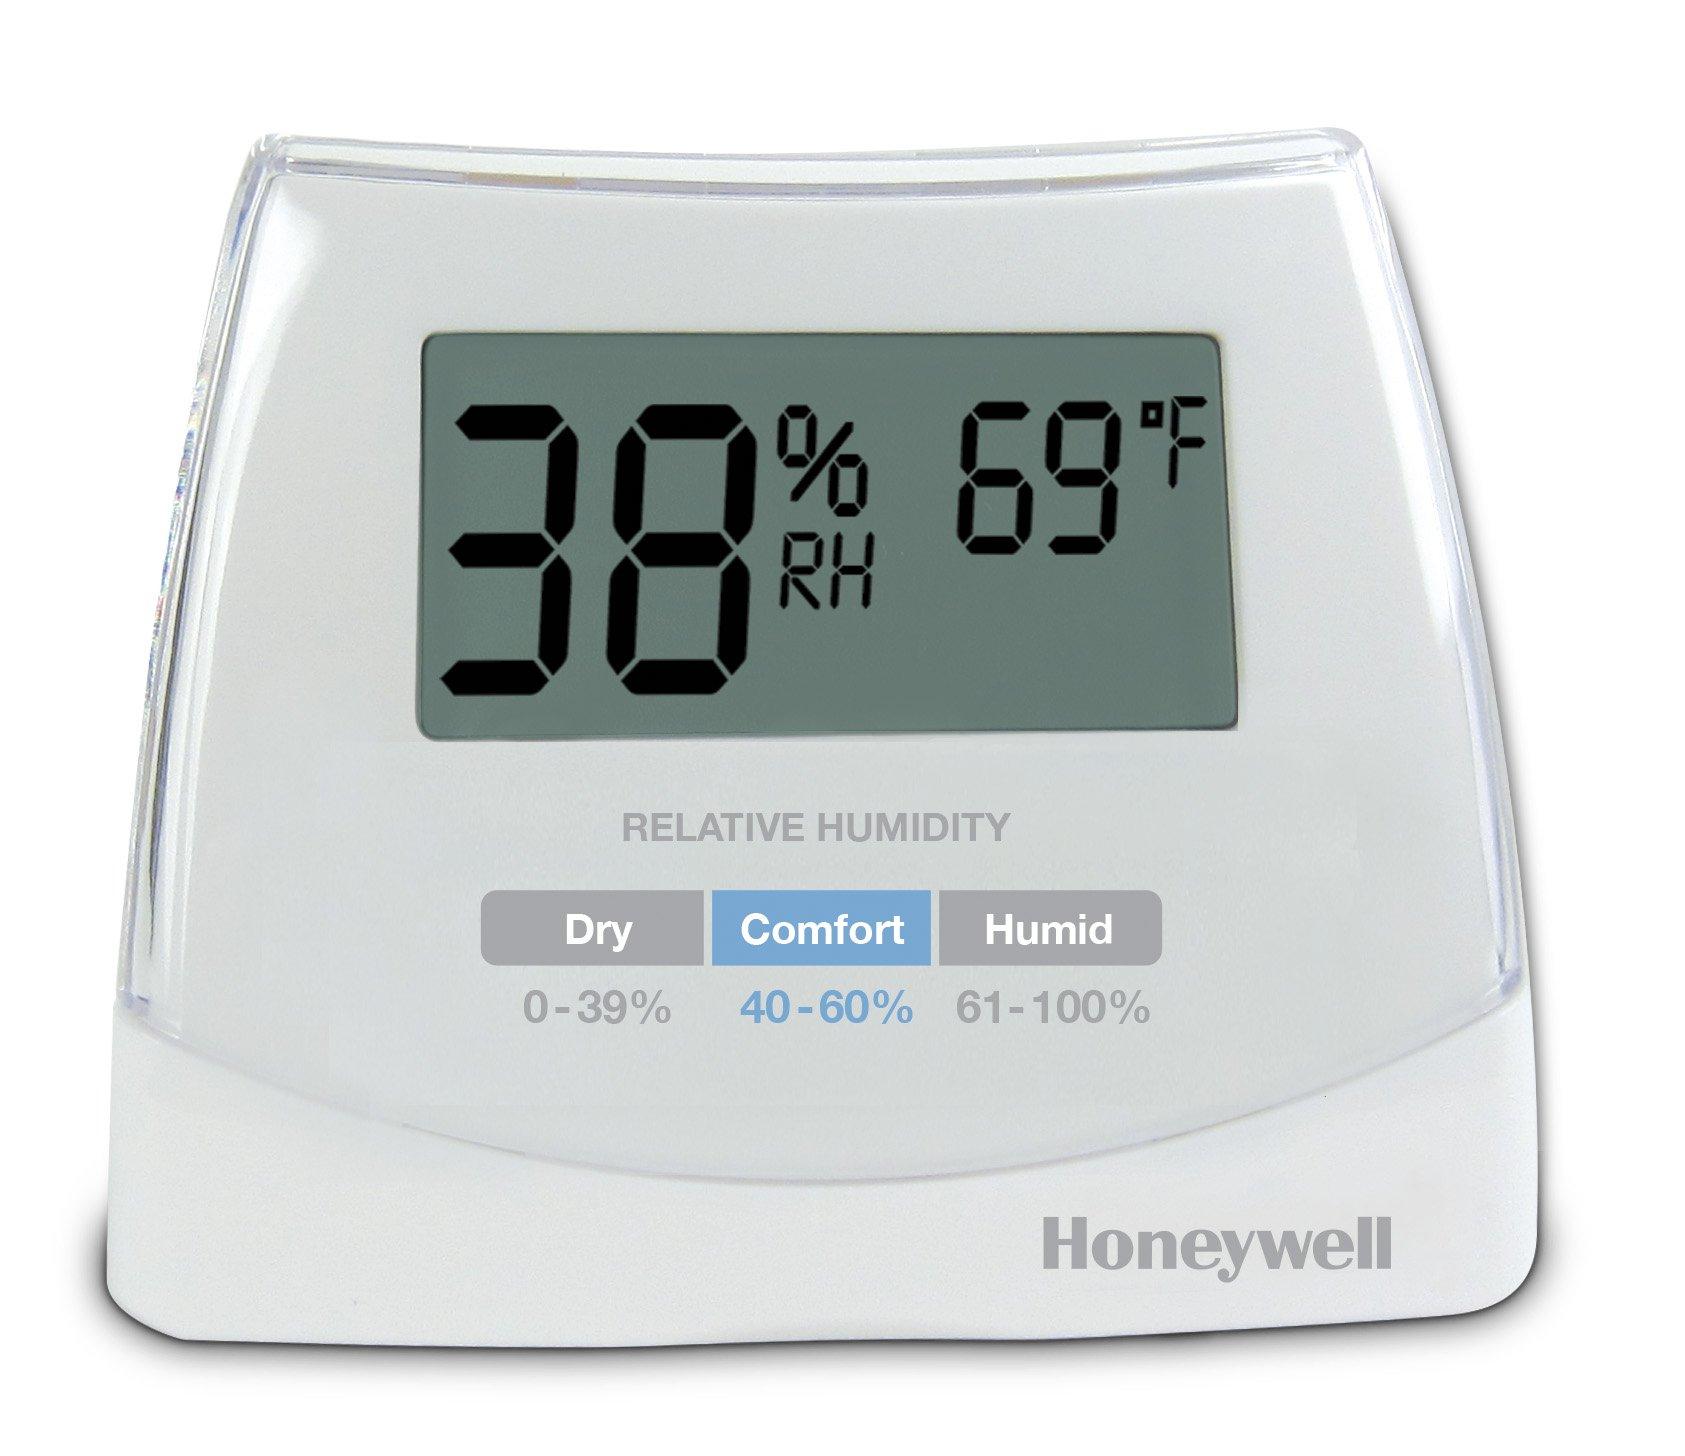 Honeywell Humidity Monitor